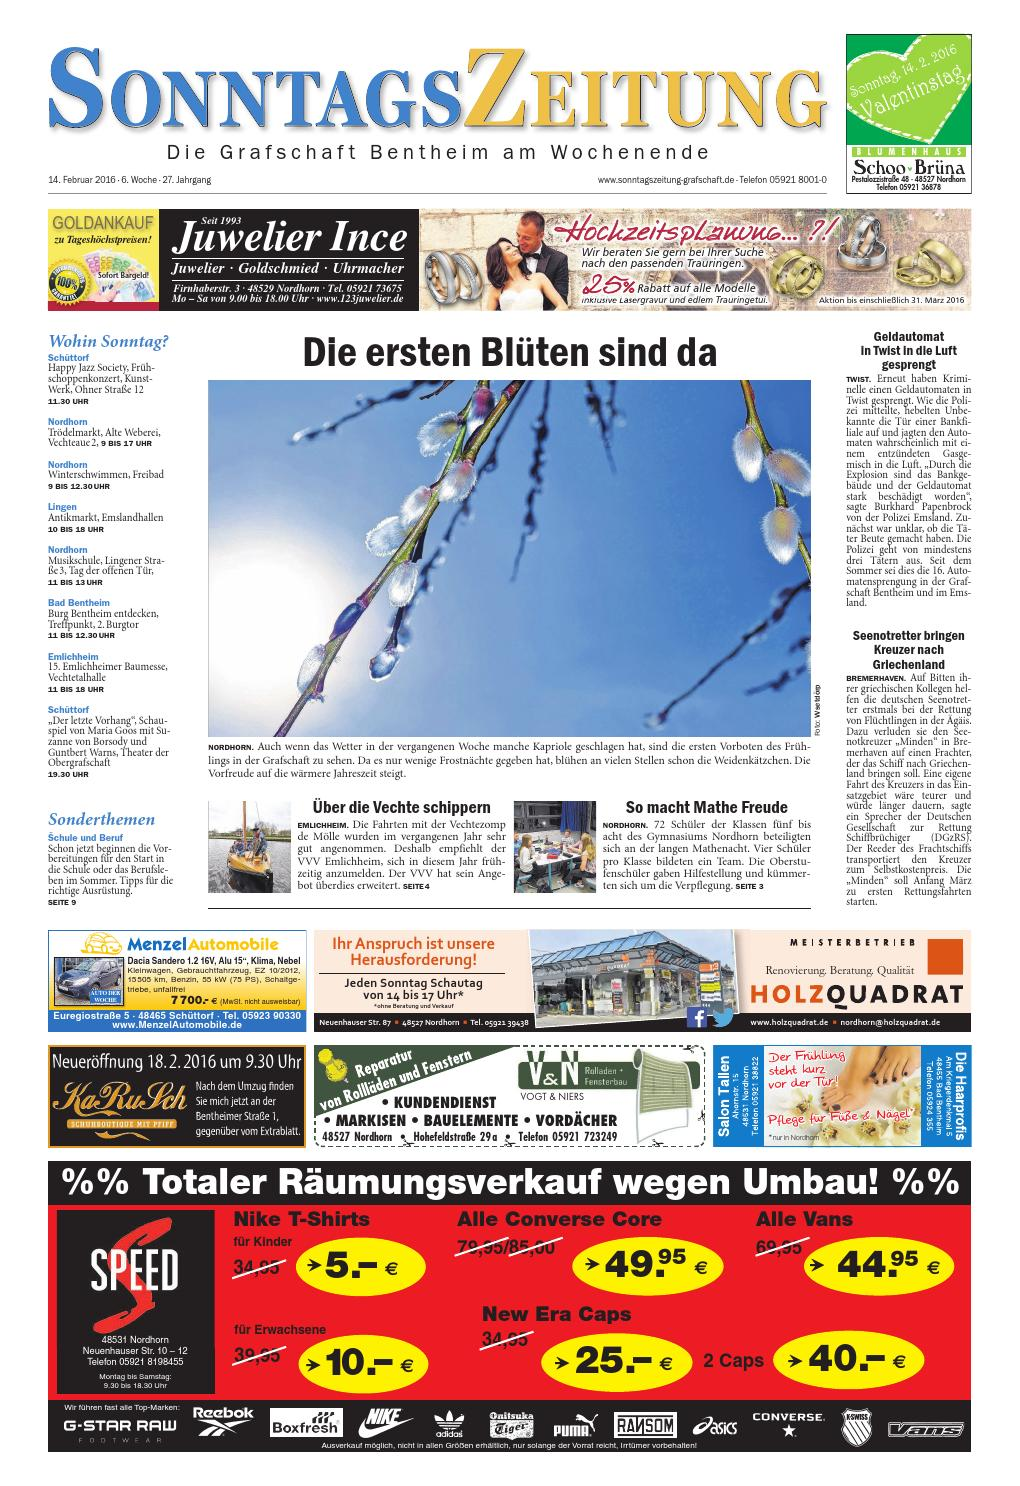 Sonntagszeitung 14 2 2016 By Sonntagszeitung Issuu